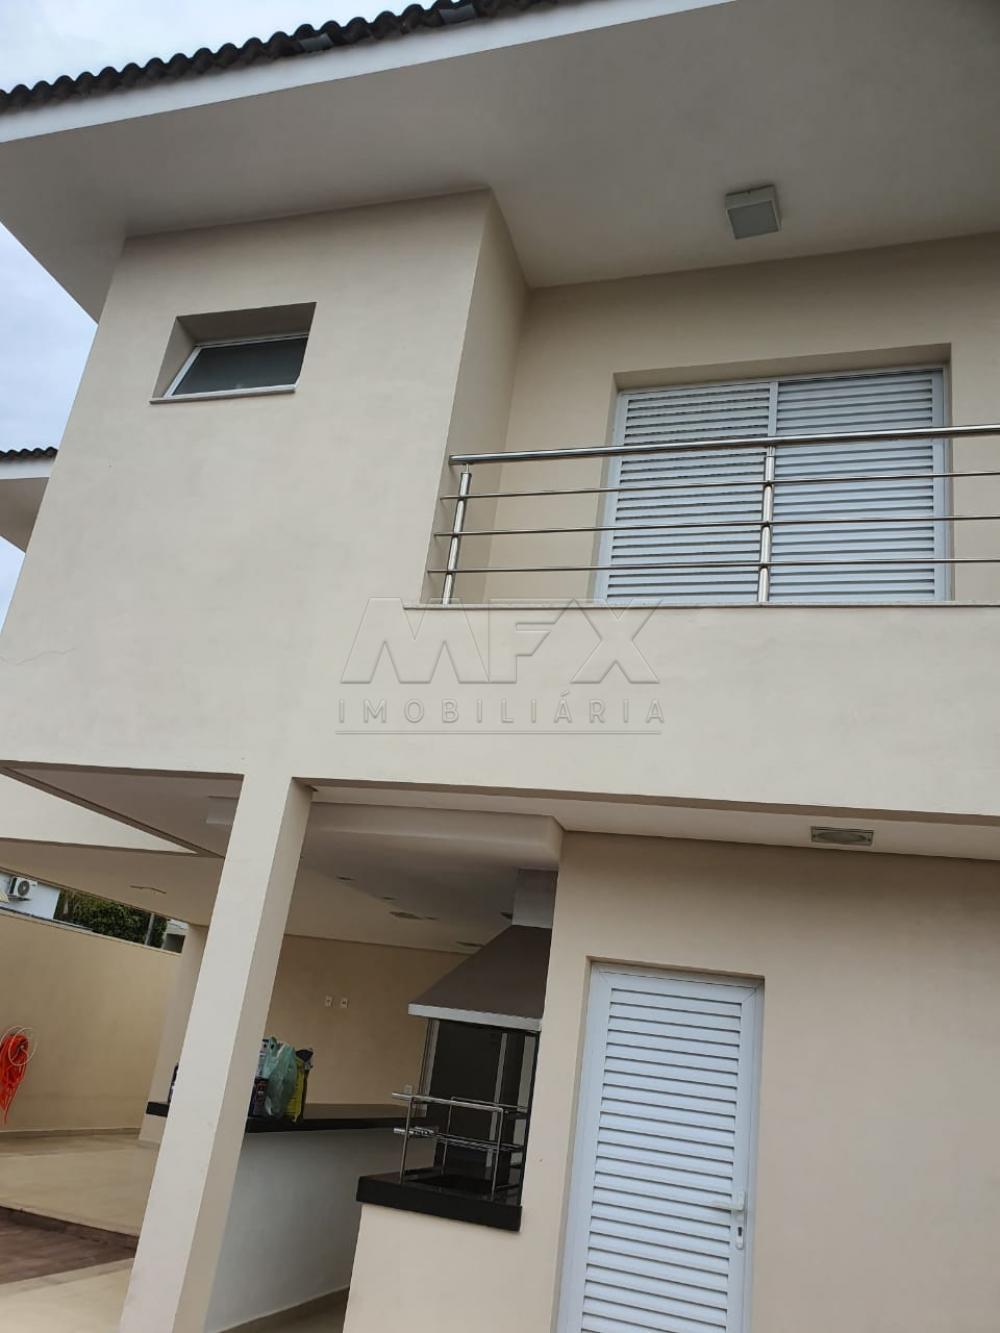 Alugar Casa / Condomínio em Bauru apenas R$ 6.800,00 - Foto 6